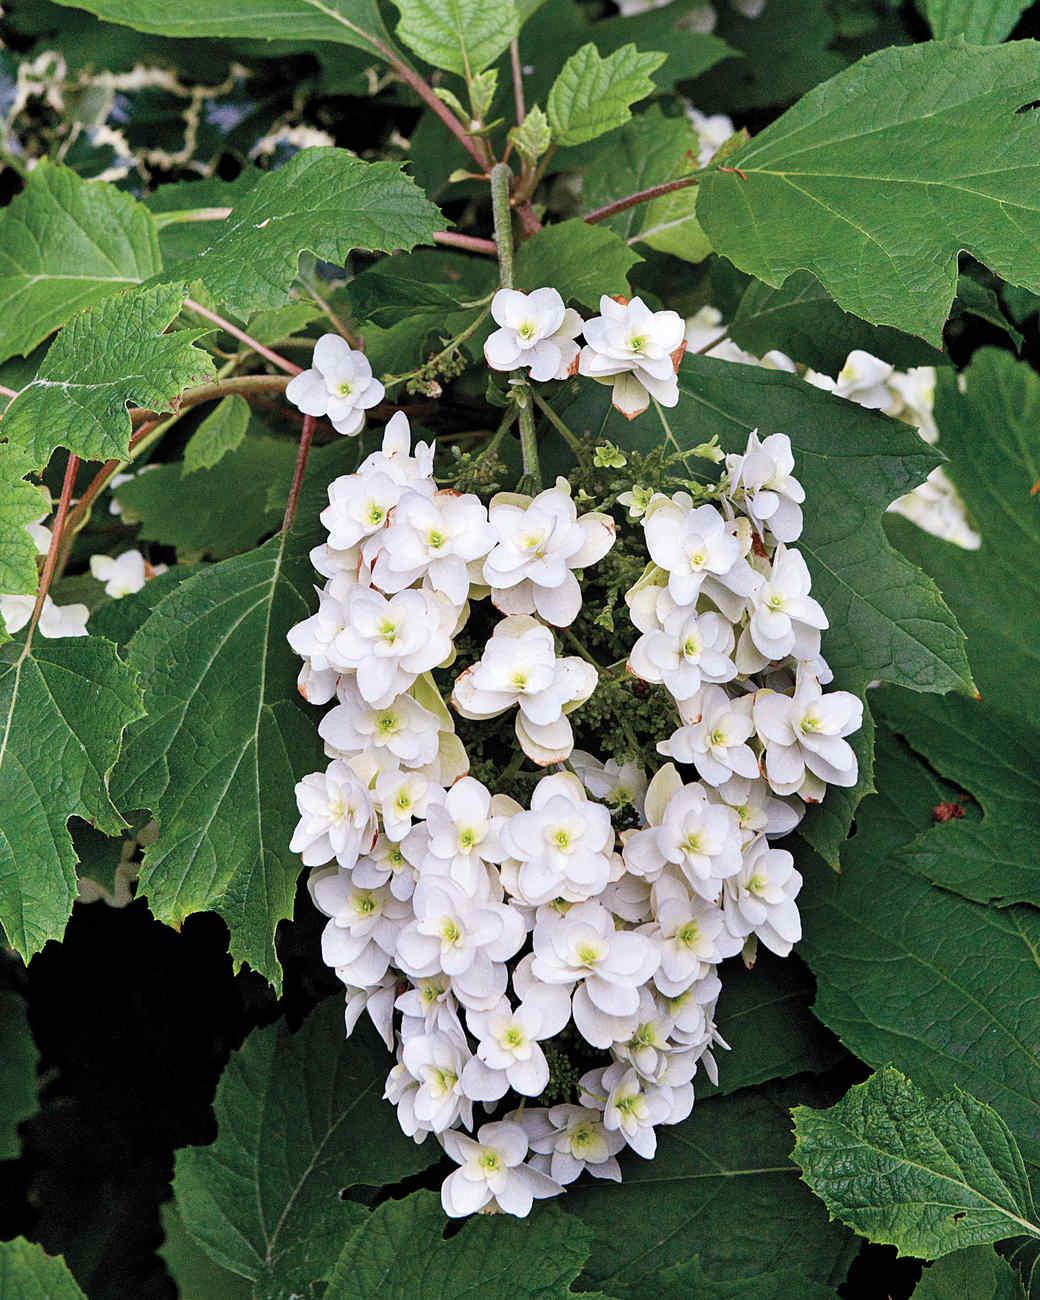 heckler-hydrangea-garden-522197aj-dsc6232-s111010.jpg